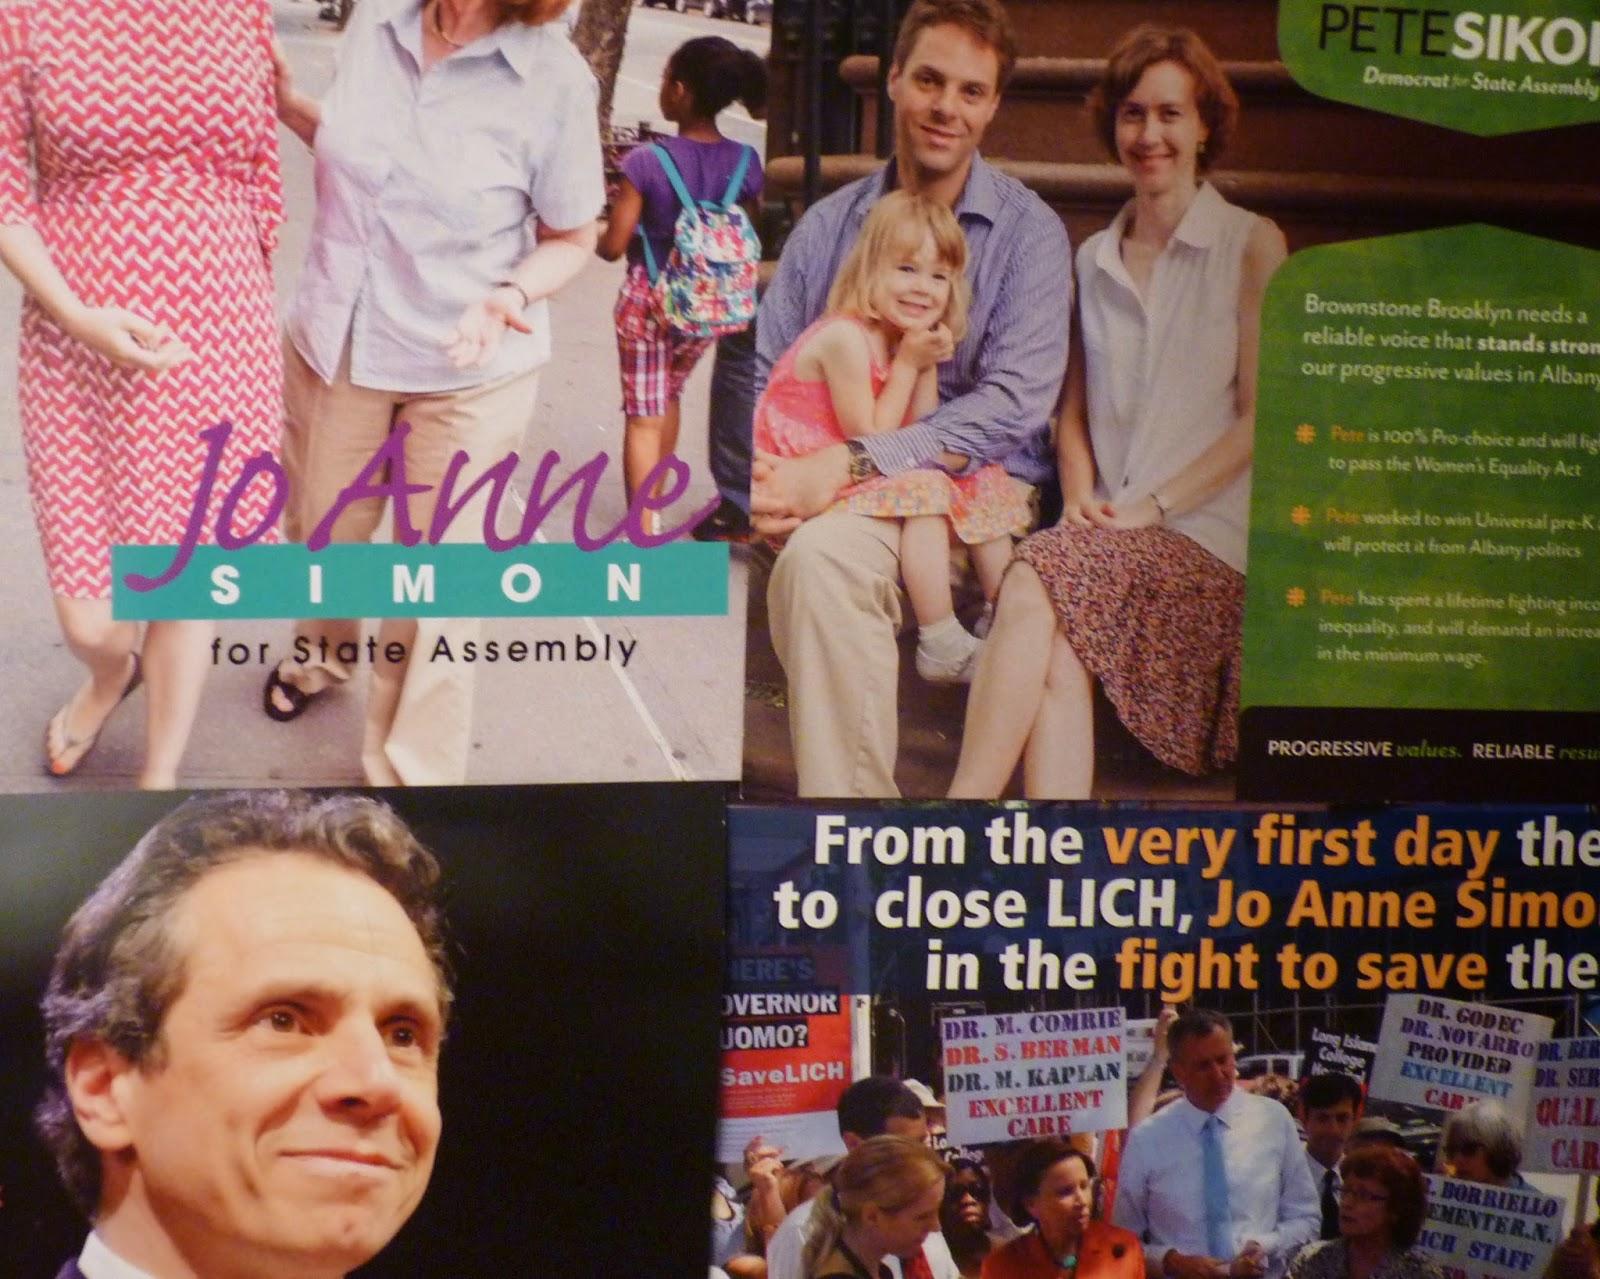 Jo Anne Simon, Peter Sikora, Gov. Cuomo campaign flyers